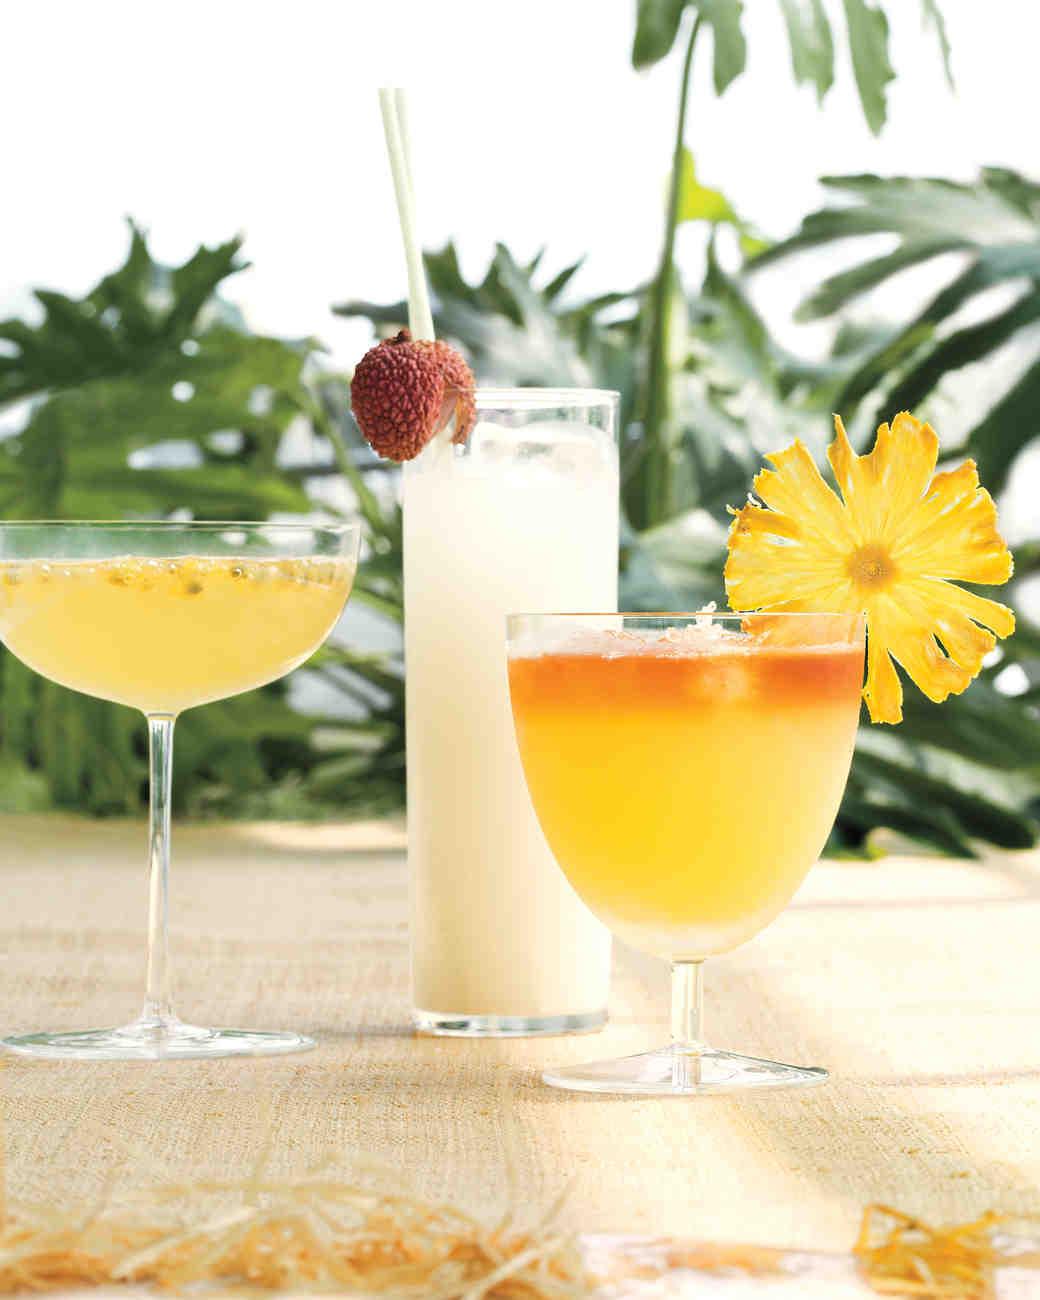 hawaii-drinks-121-d111376.jpg